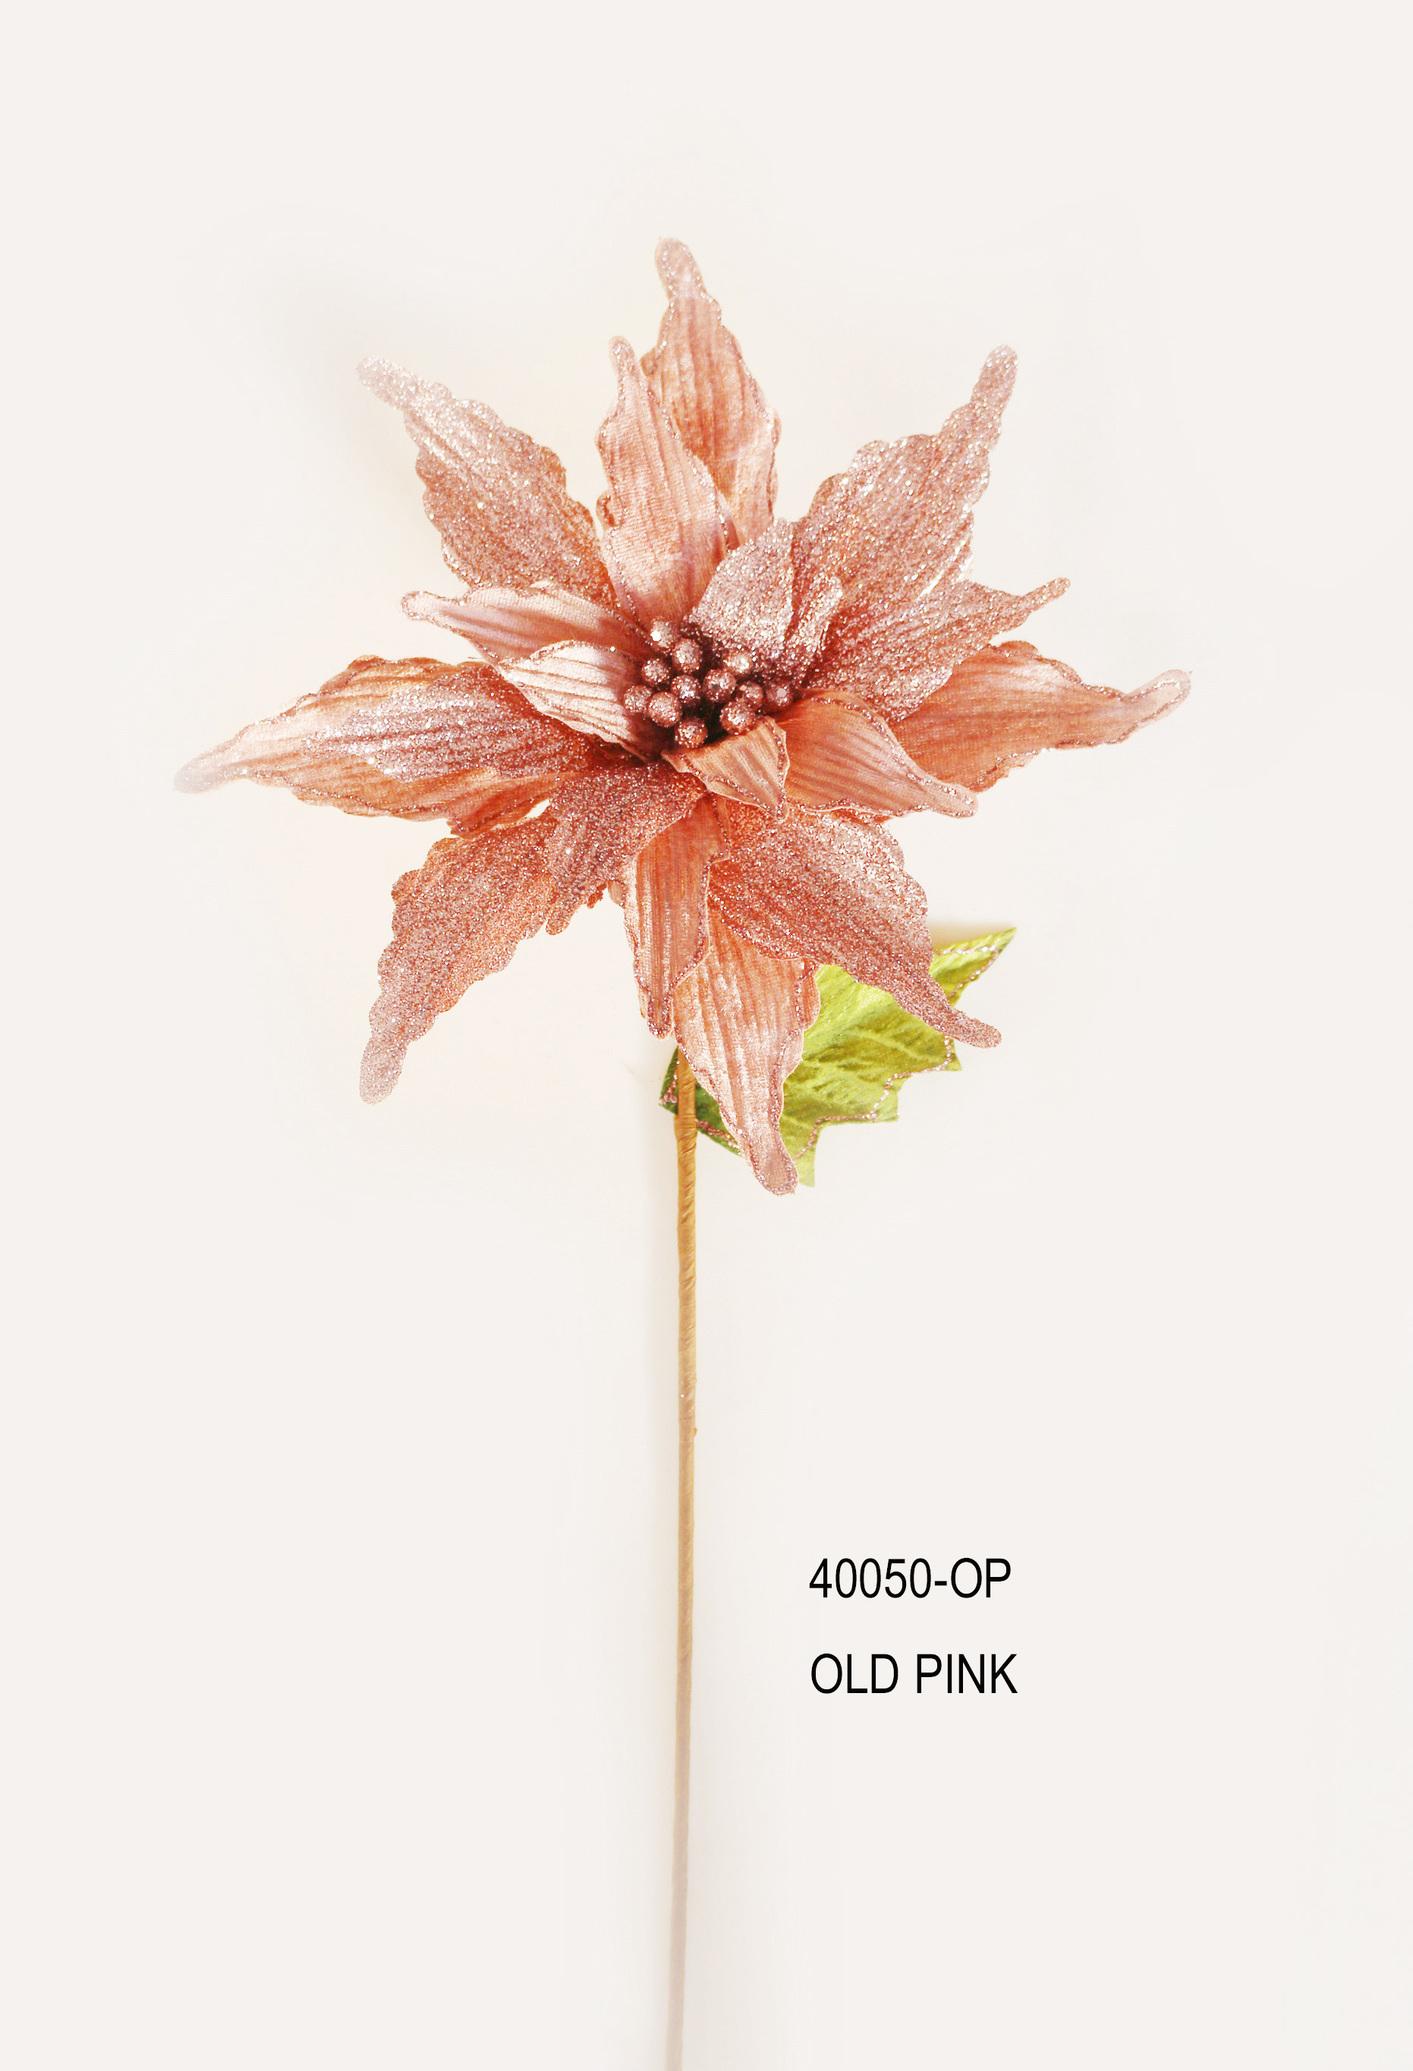 40050-OP